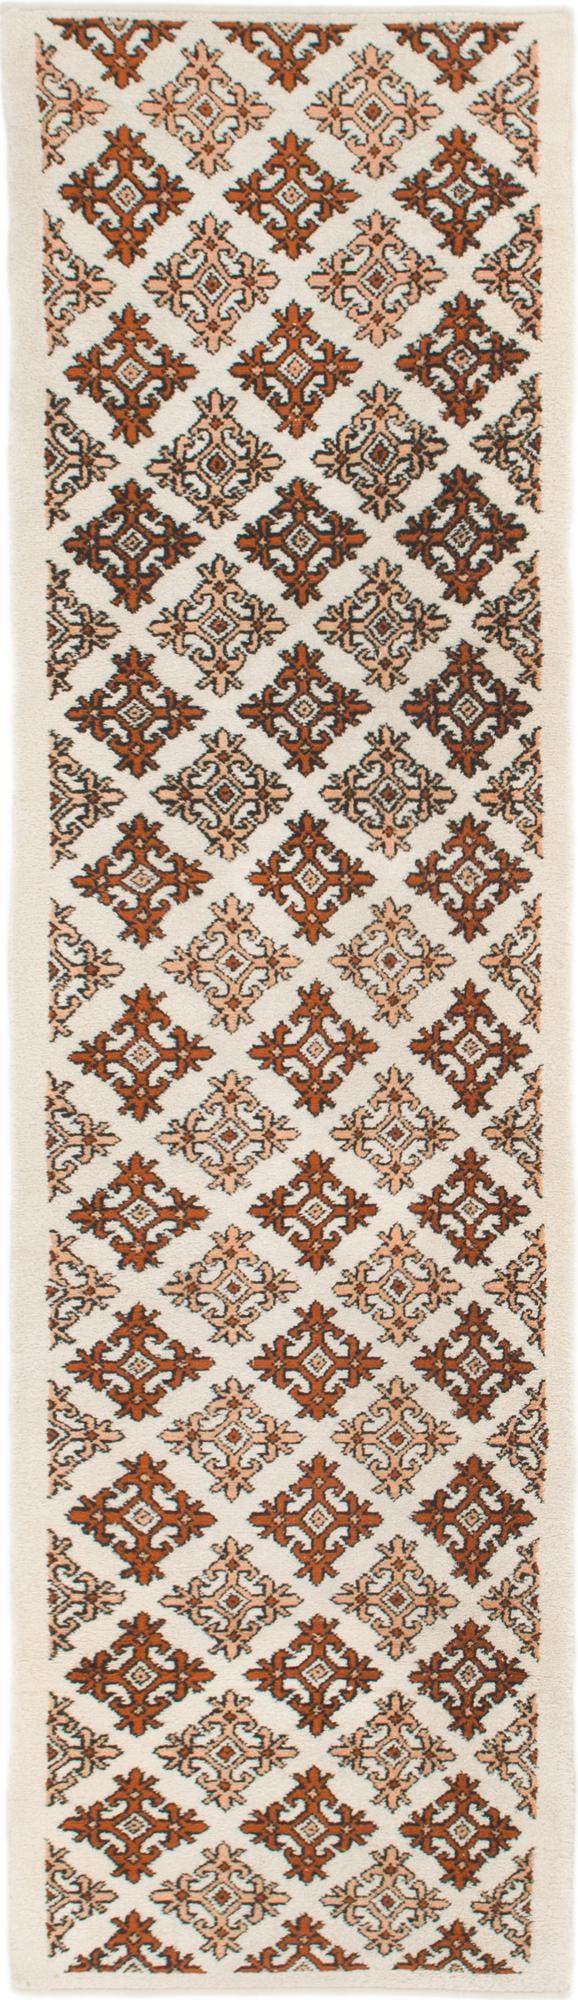 2' 8 x 9' 9 Moroccan Oriental Runner Rug main image